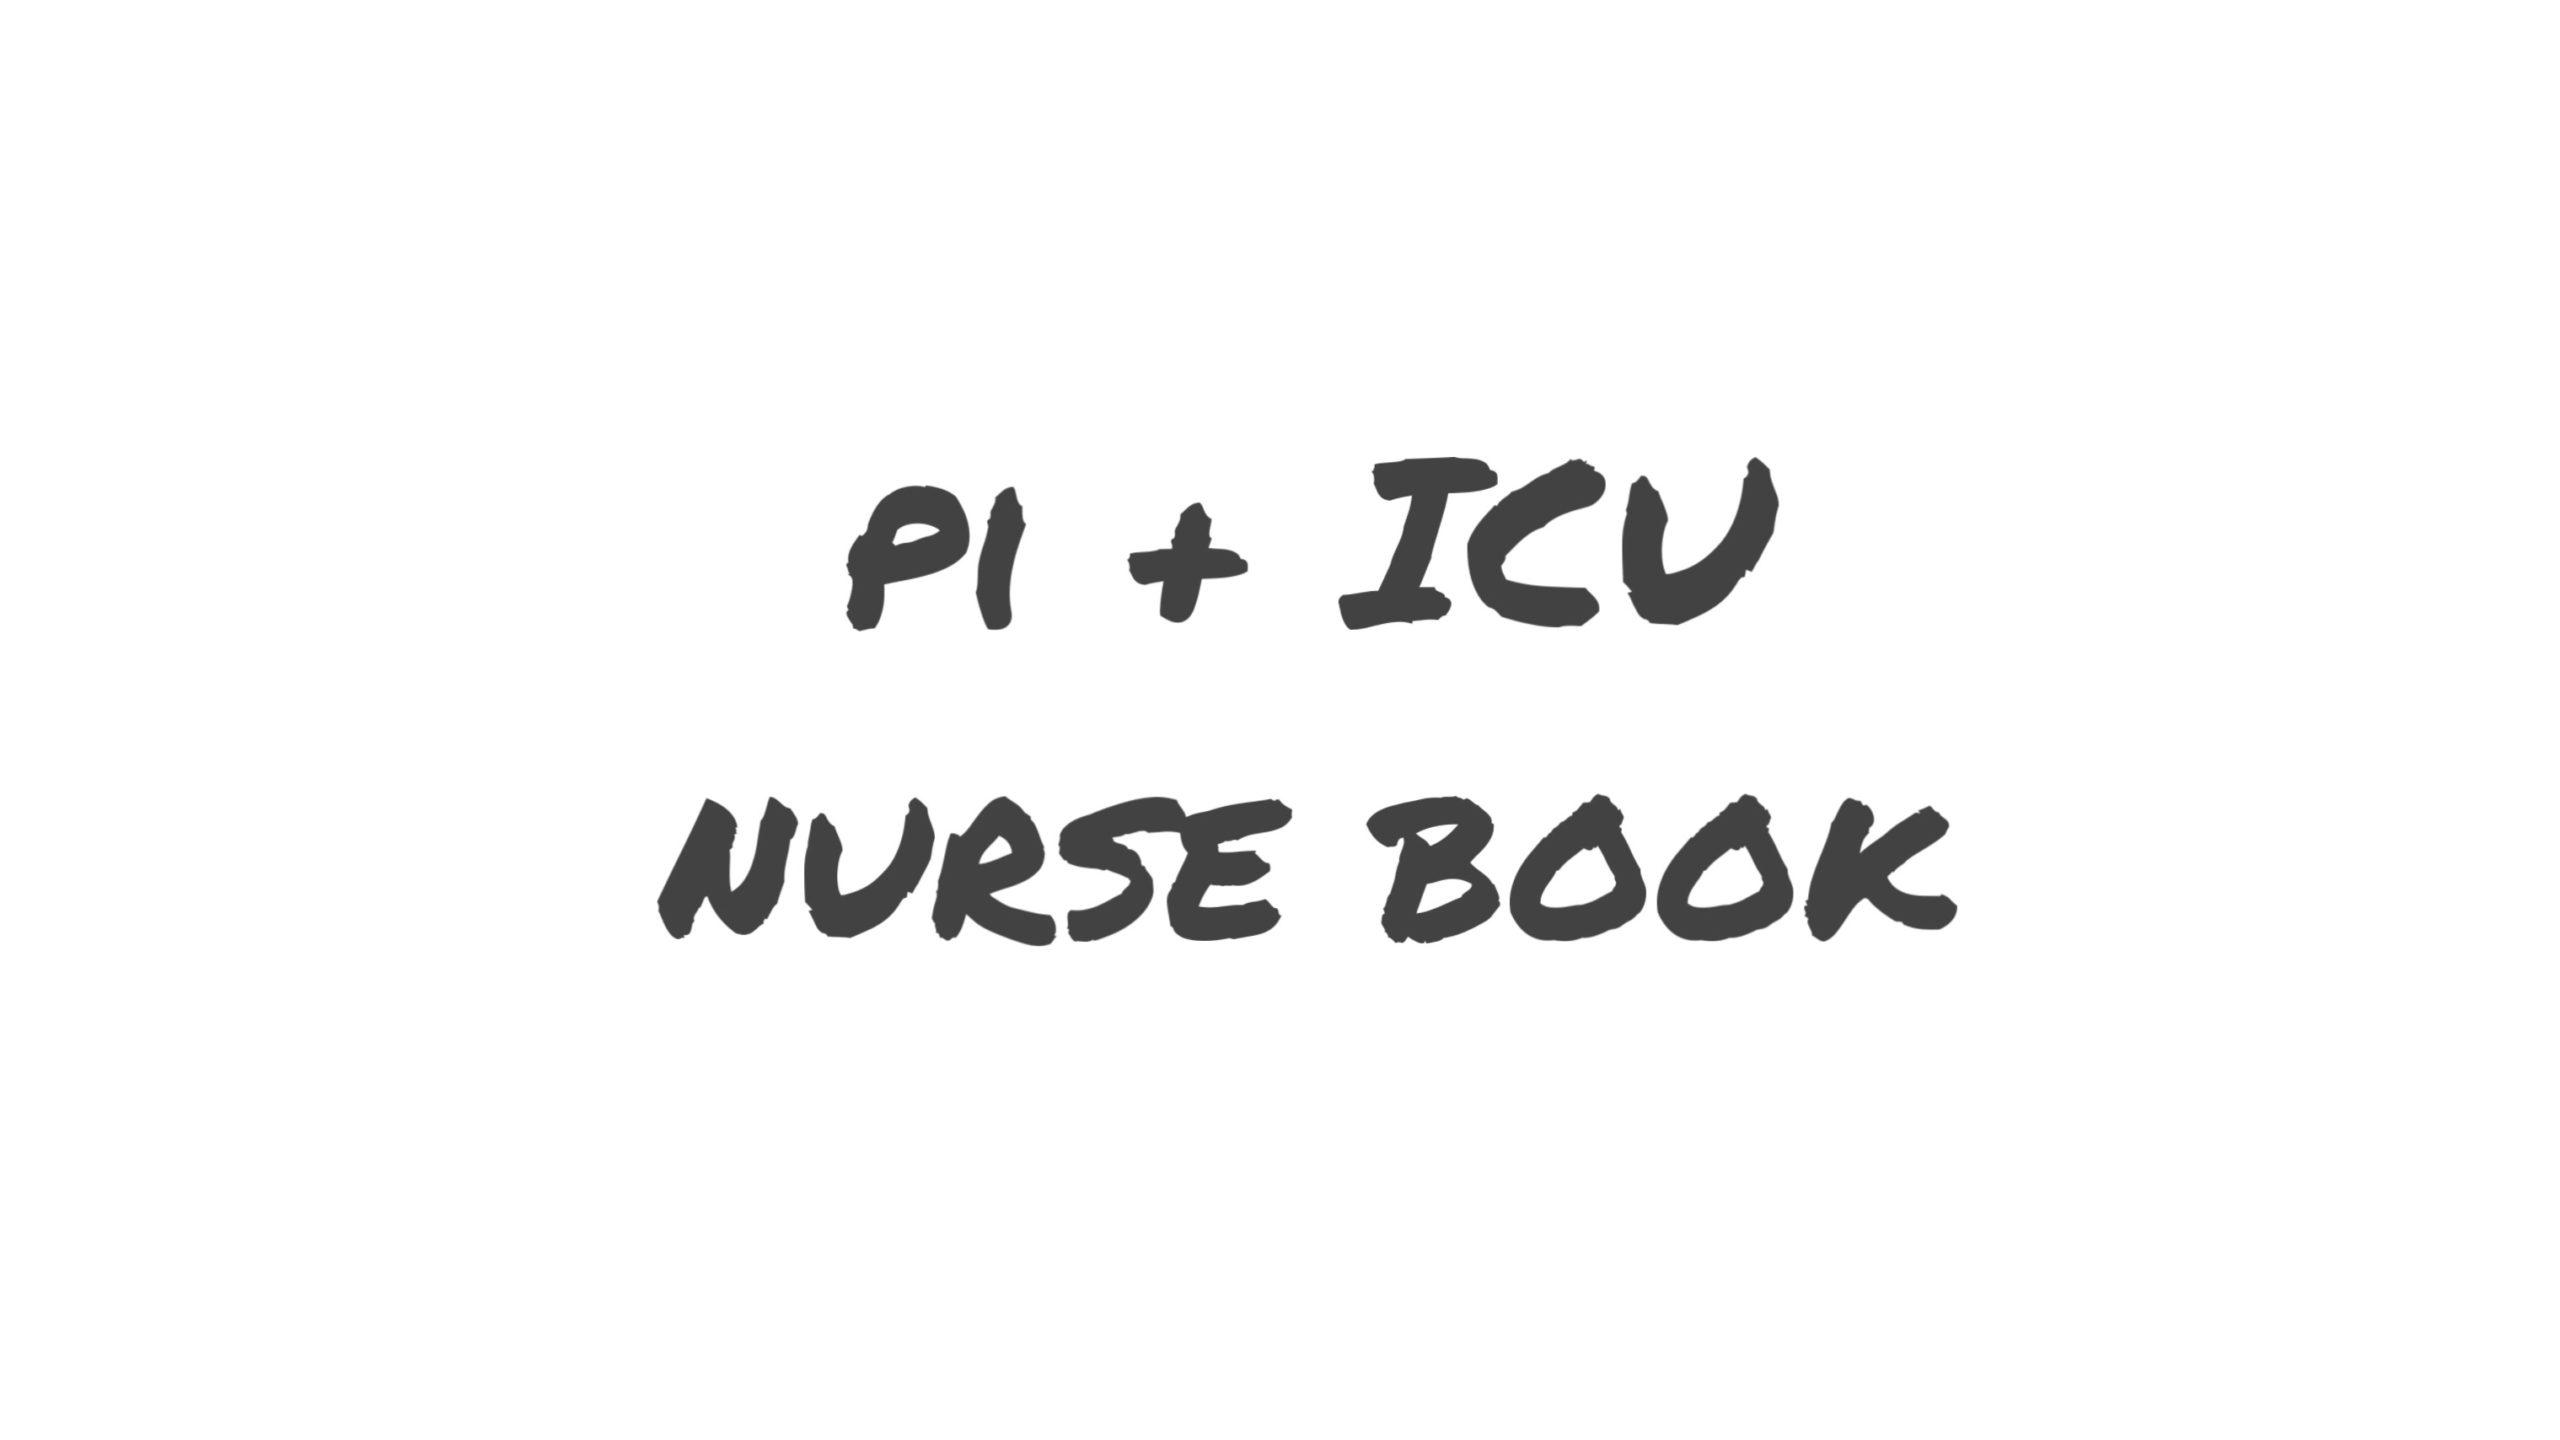 PI+ICU NURSE BOOK